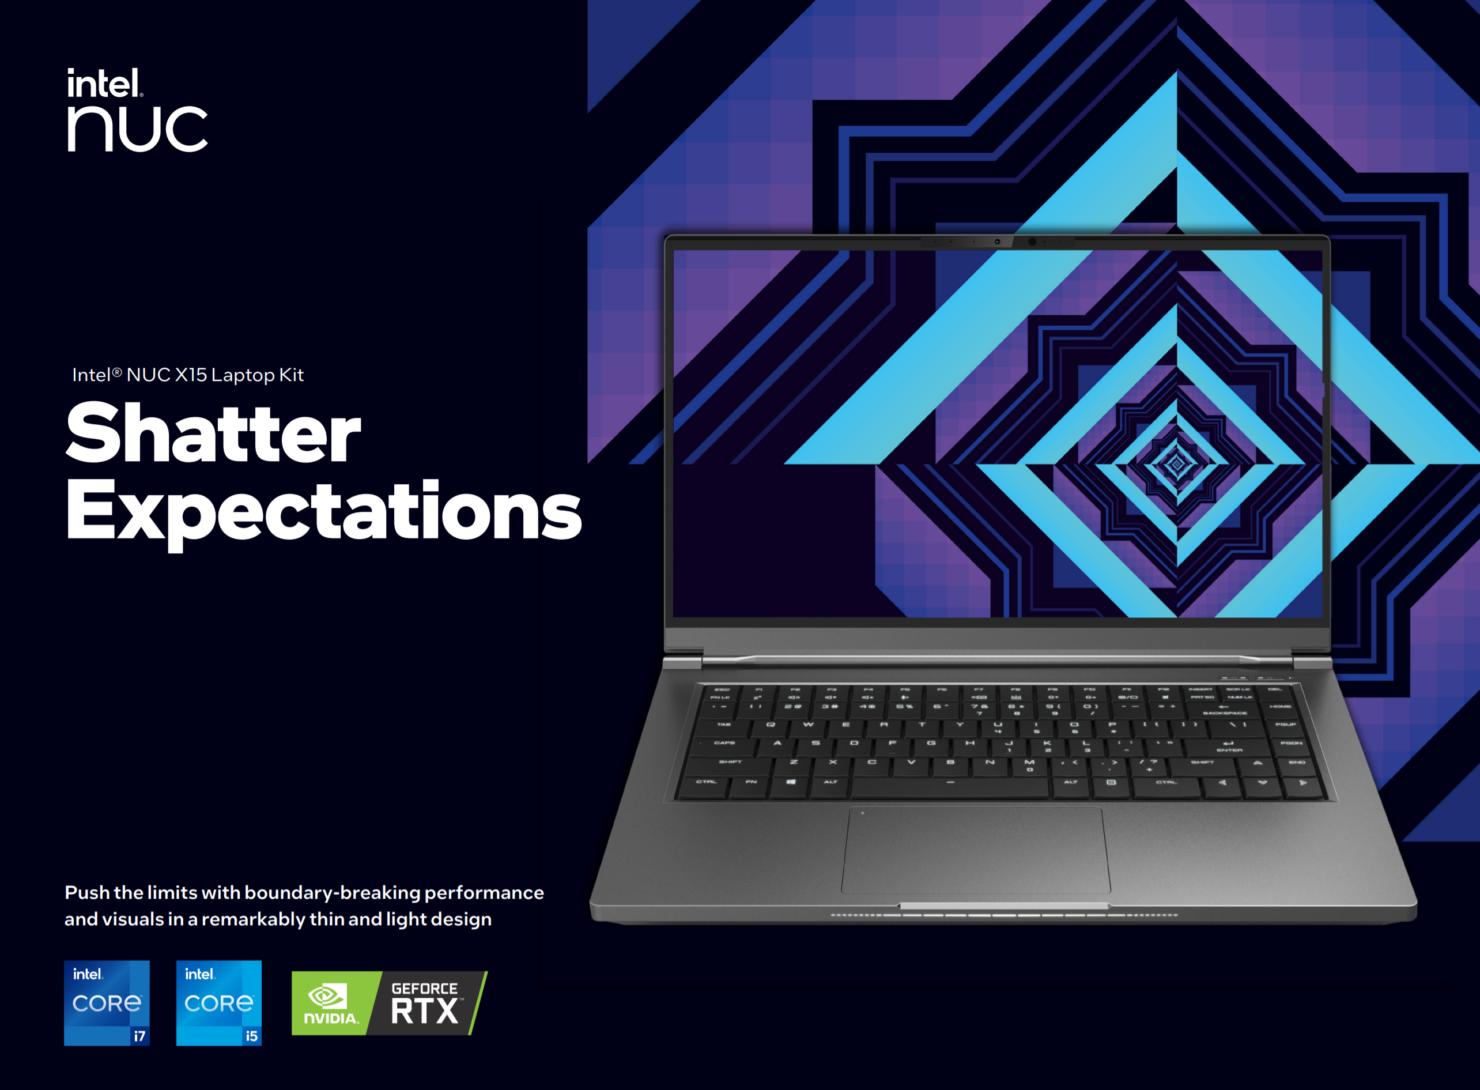 Intel Presents NUC X15 Reference Gaming Laptop Kit - Features Tiger Lake-H CPUs & GeForce RTX 30 Series GPUs